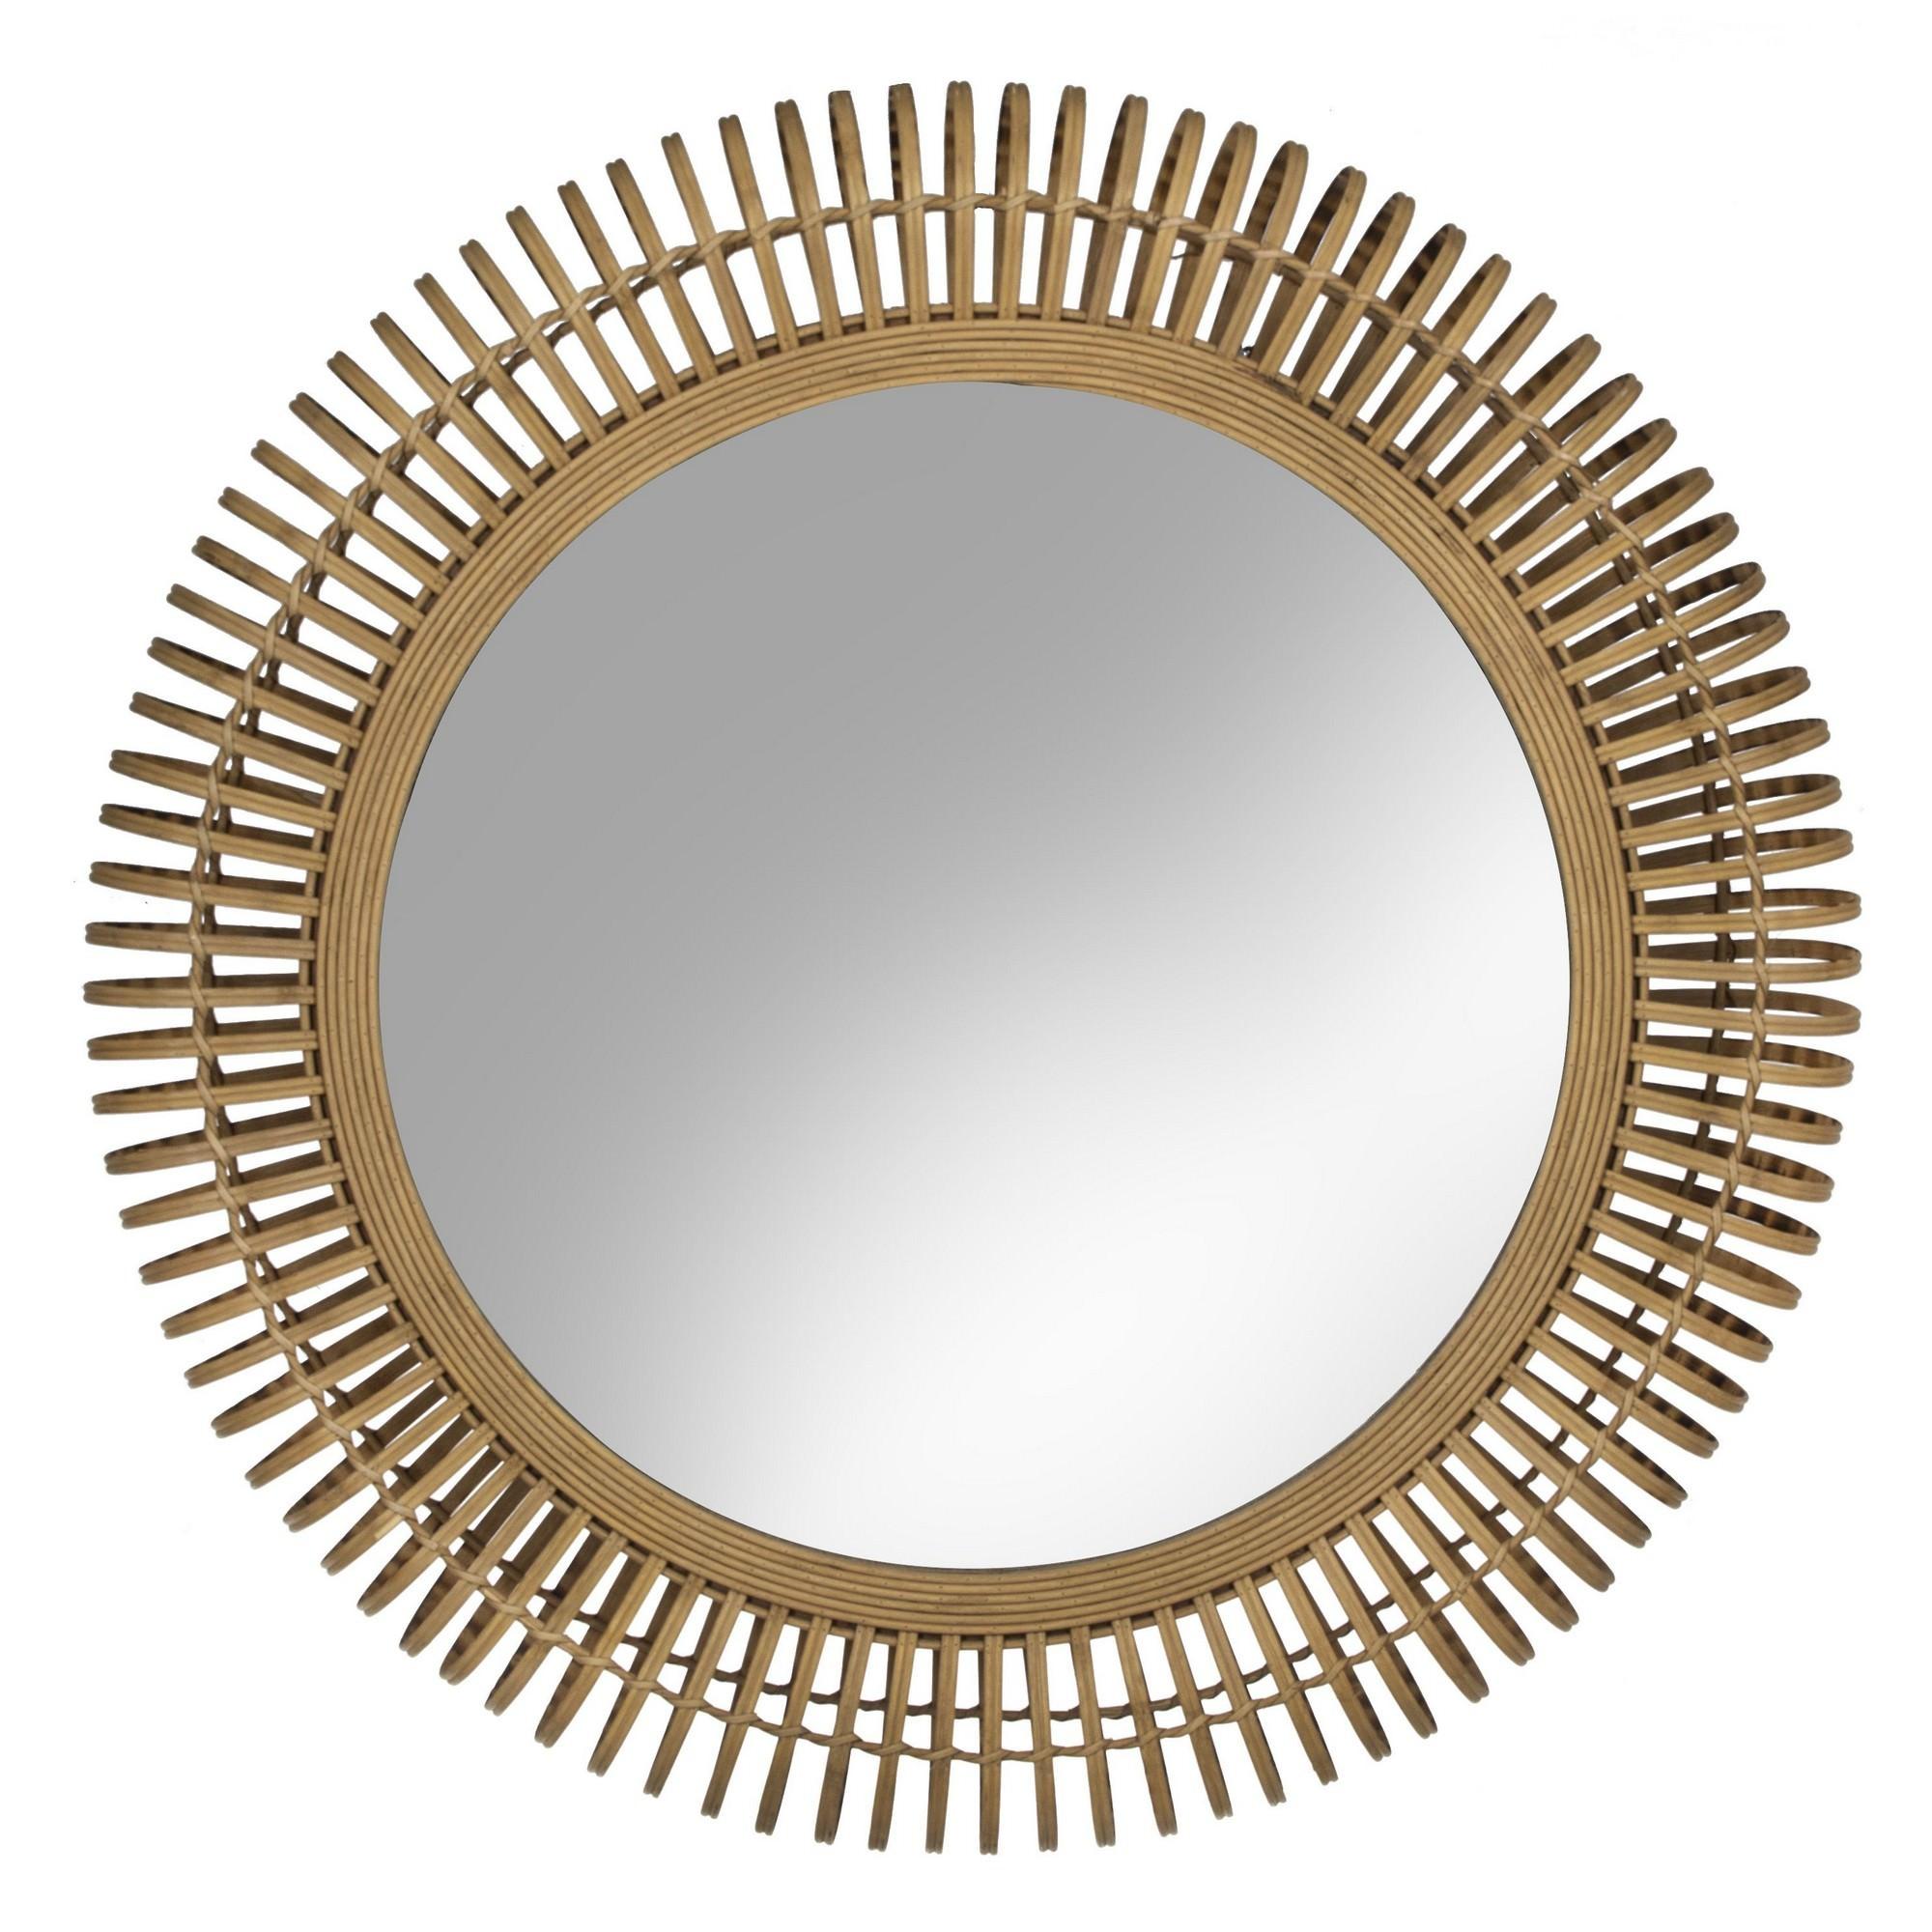 Zeke Bamboo Rattan Frame Round Wall Mirror, 80cm